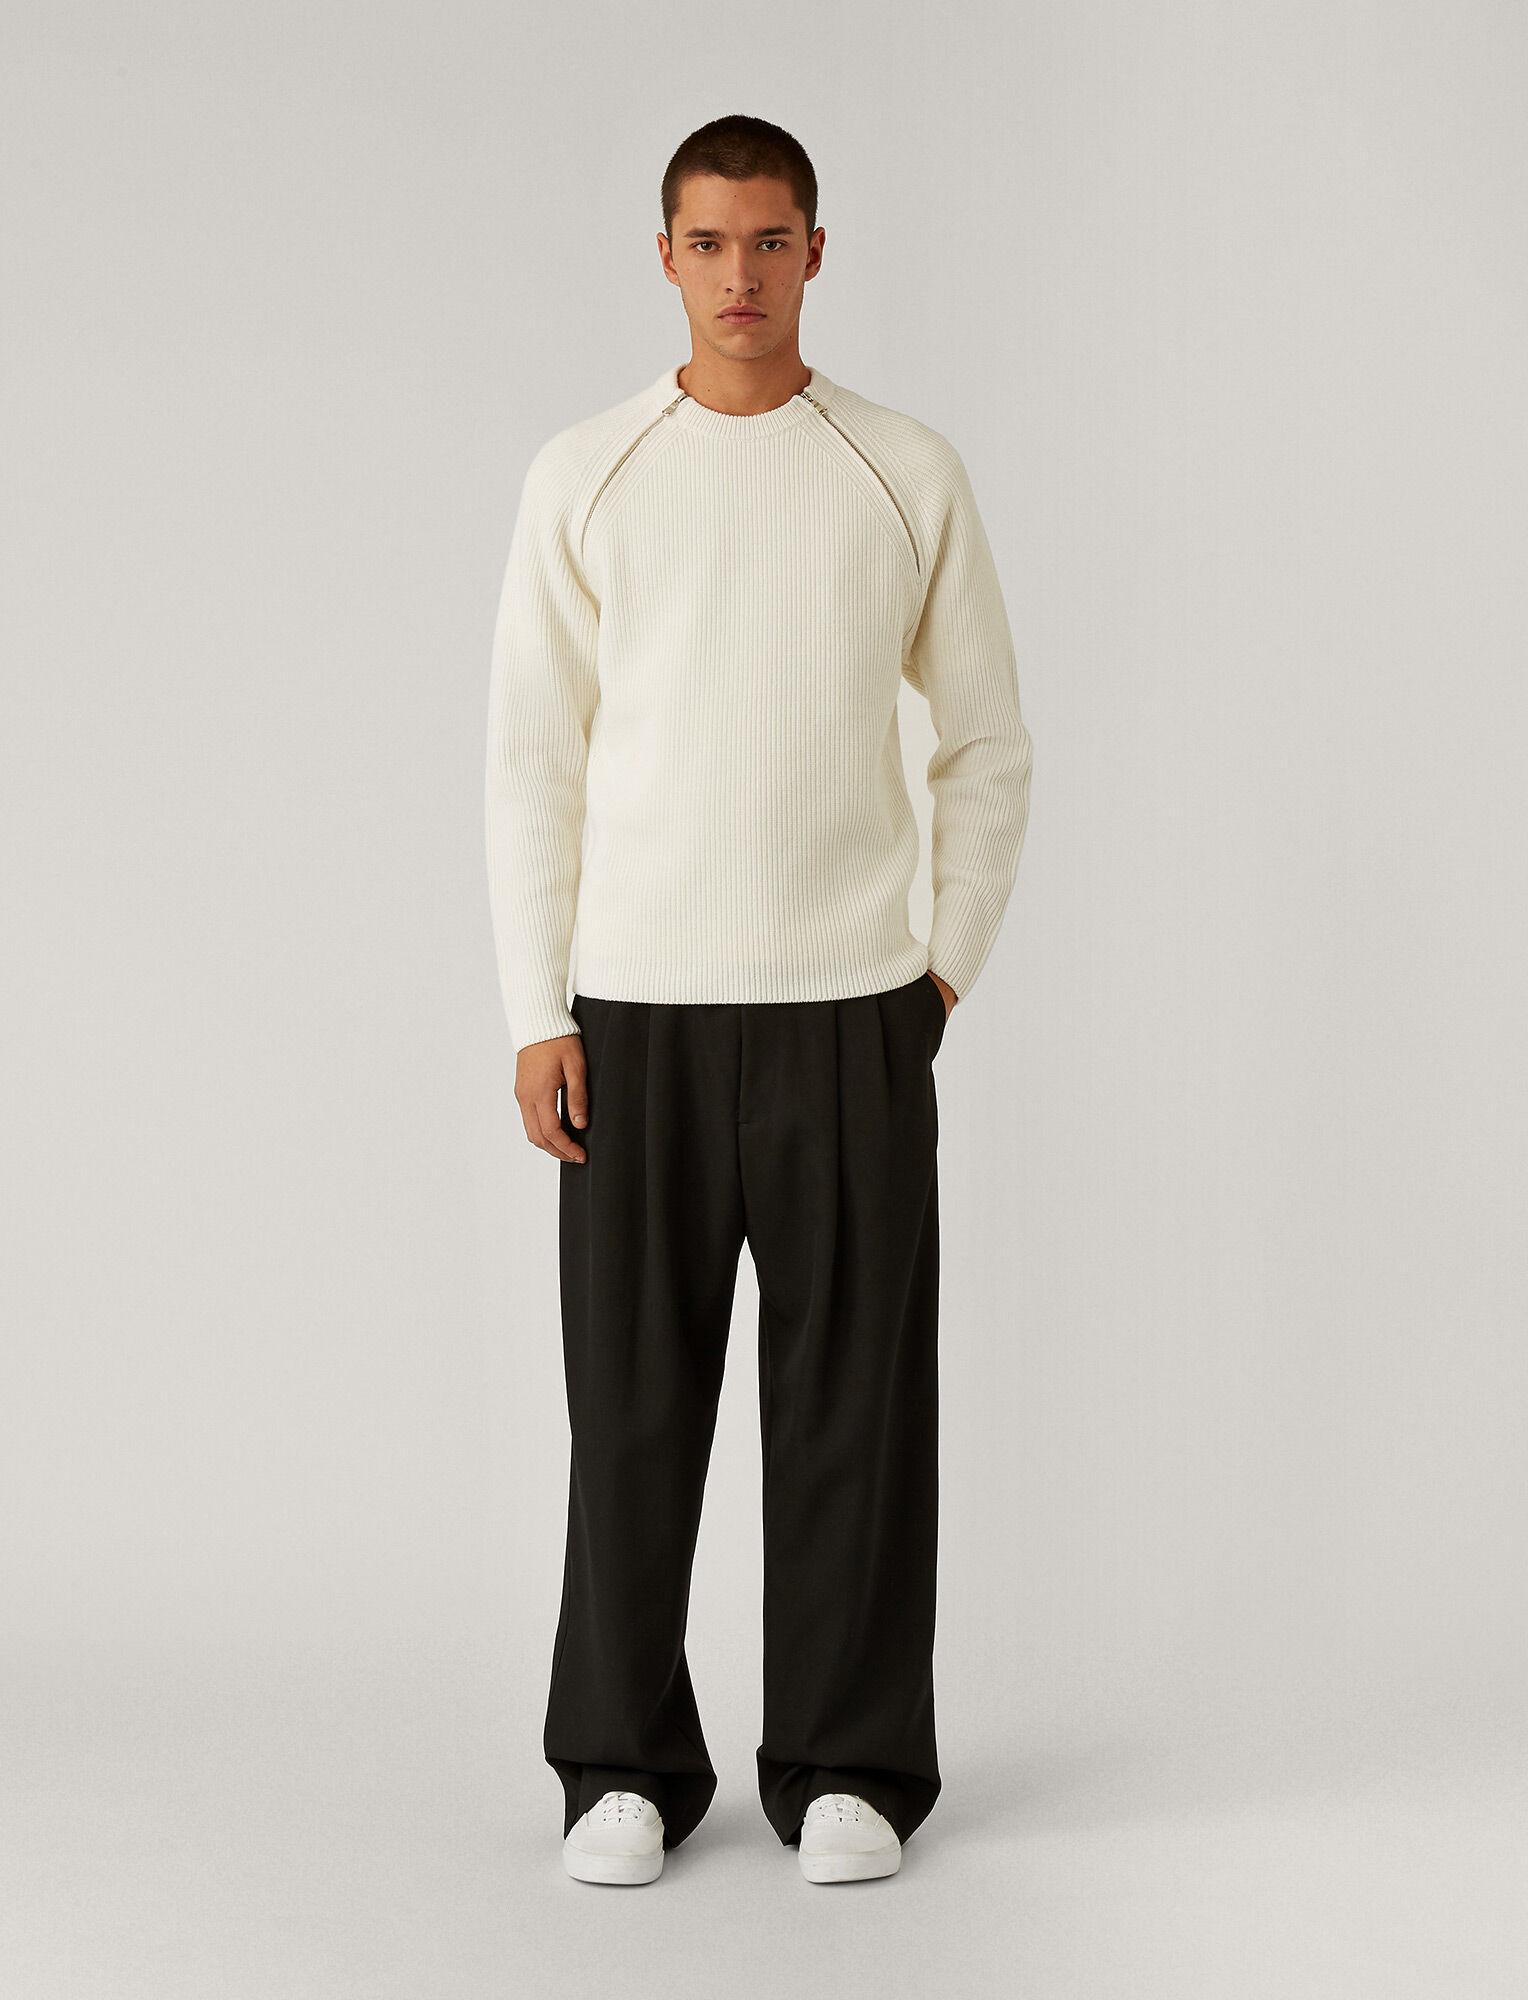 Joseph, Zip Merinos Knit, in White